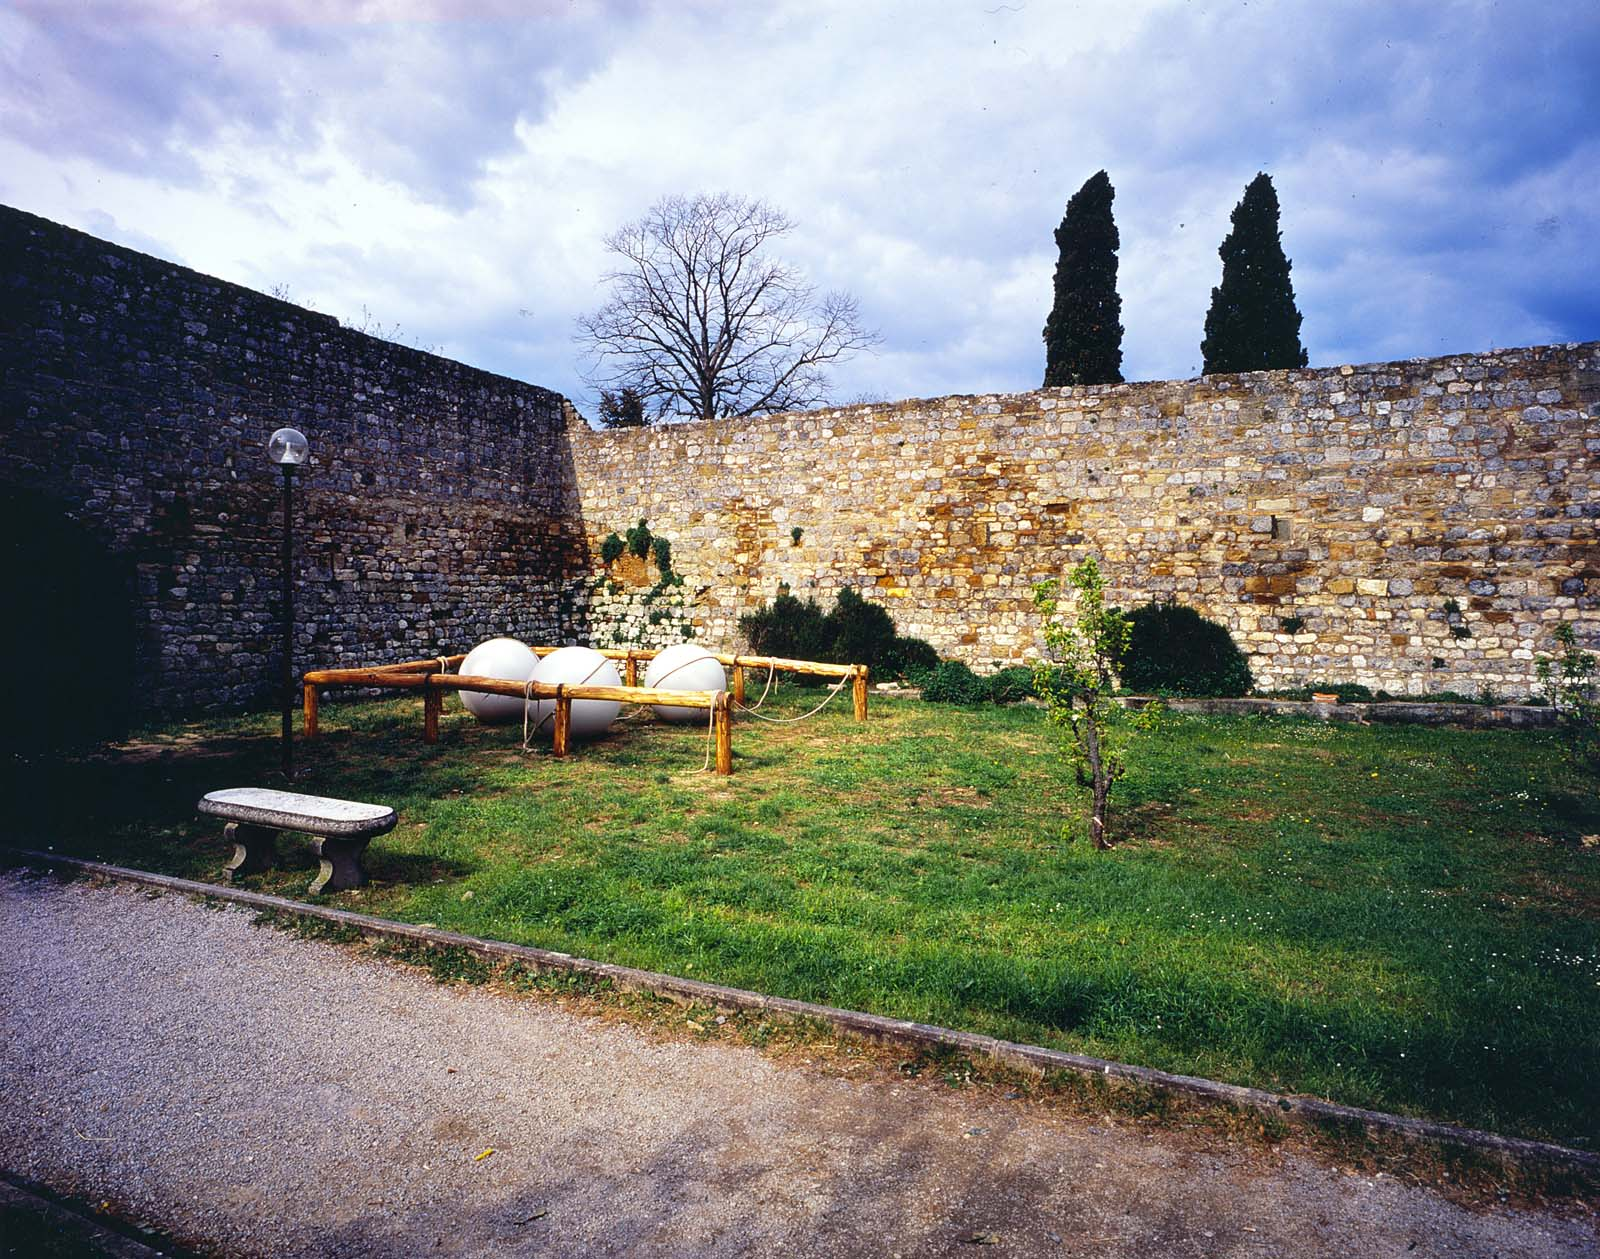 View-of-installation-San-Gimignano-2001-Courtesy-Galleria-Continua-San-Gimignano-Pho.jpg